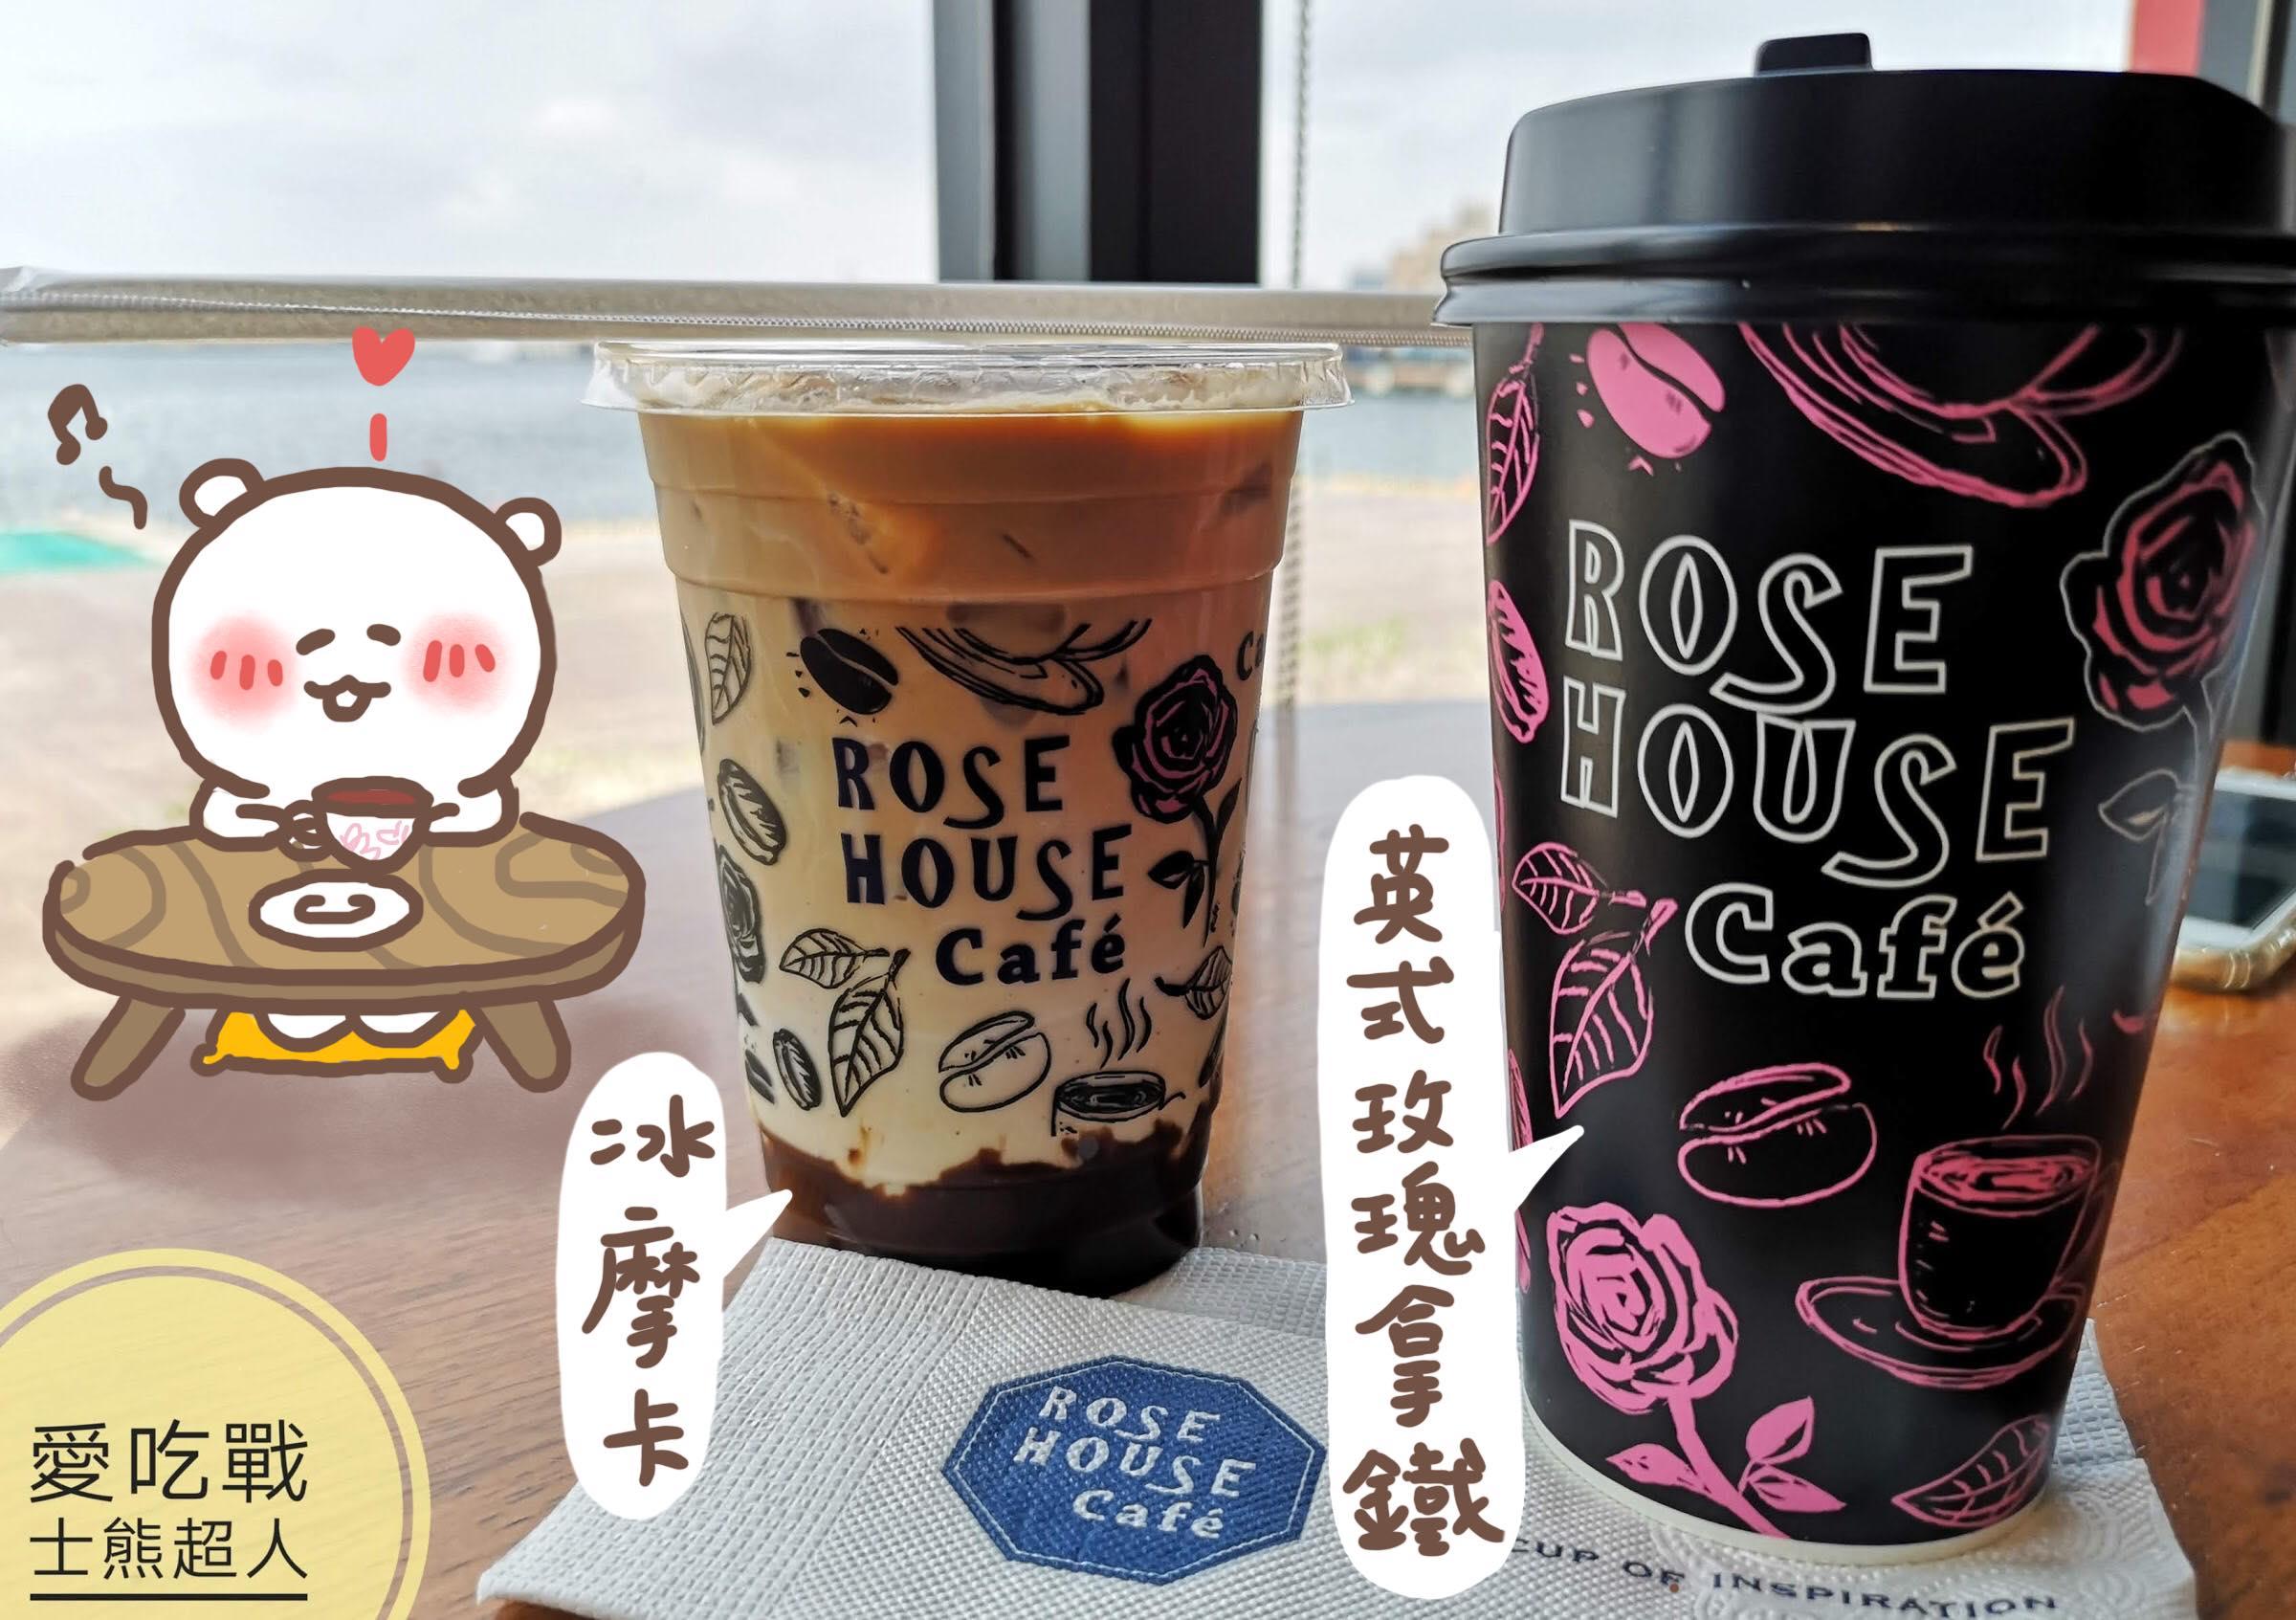 ROSE HOUSE Cafe